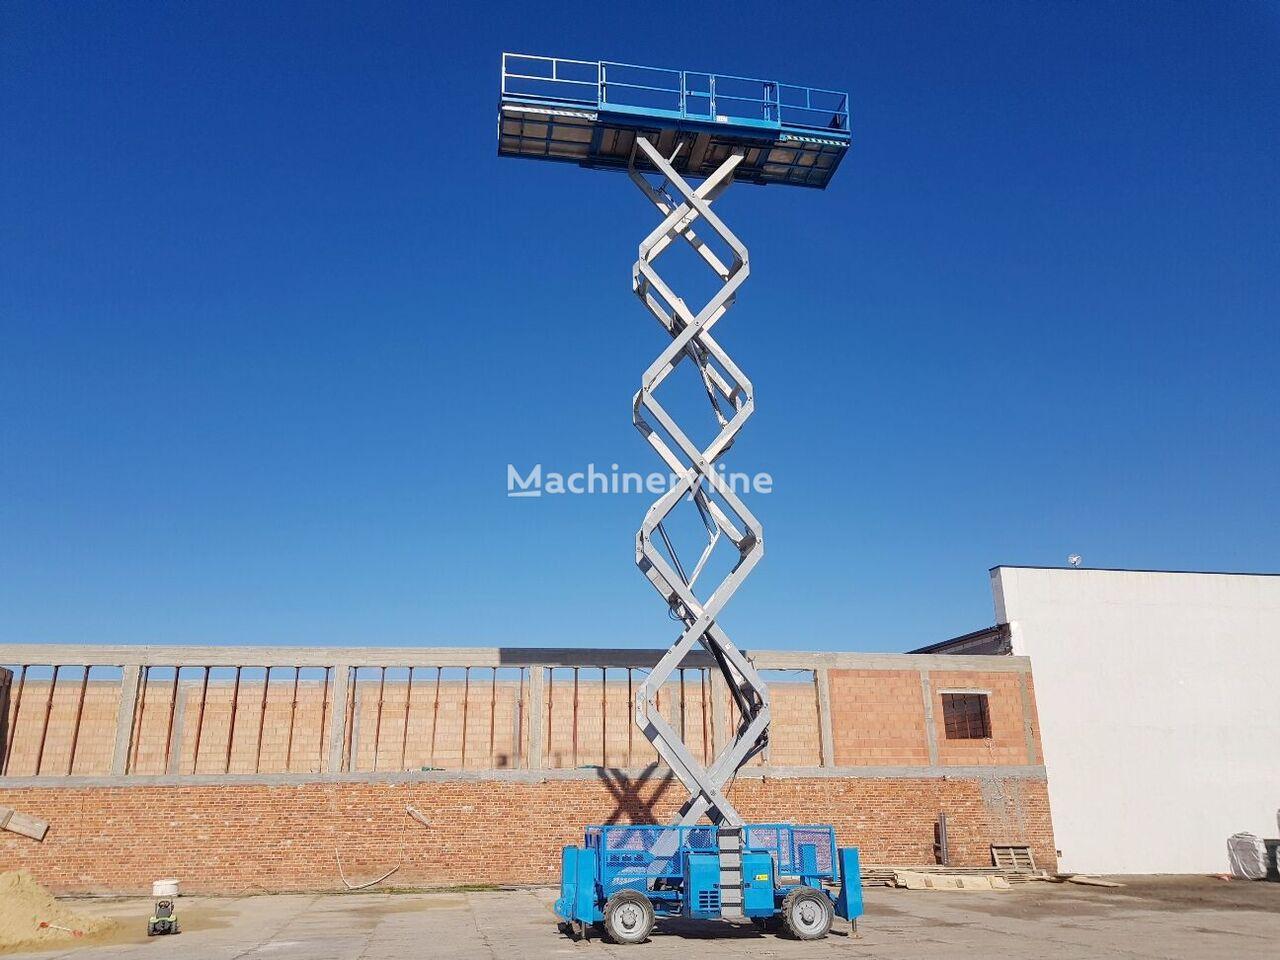 GENIE GS-5390 (jlg, manitou, haulotte, grove) R149 scissor lift